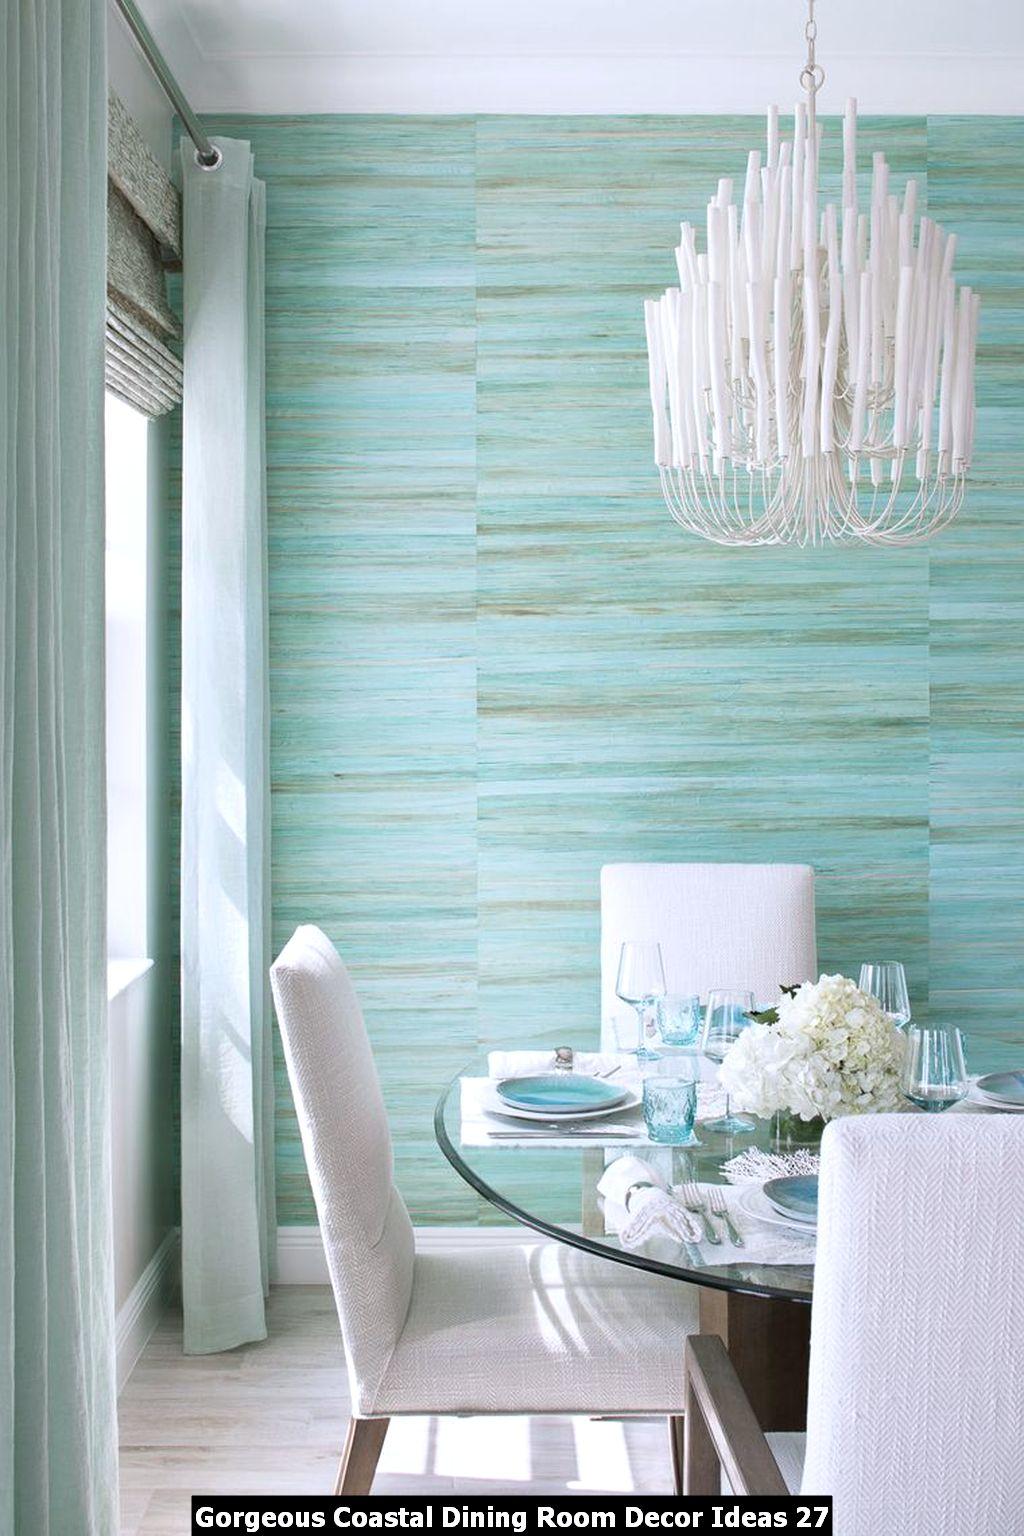 Gorgeous Coastal Dining Room Decor Ideas 27